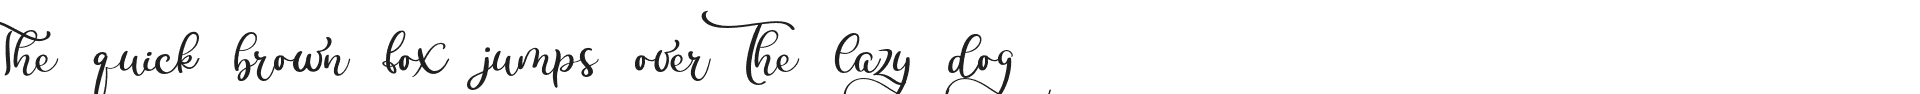 13 Cute Handwritten Fonts Bundle in 2020 - image.php?font=Delight